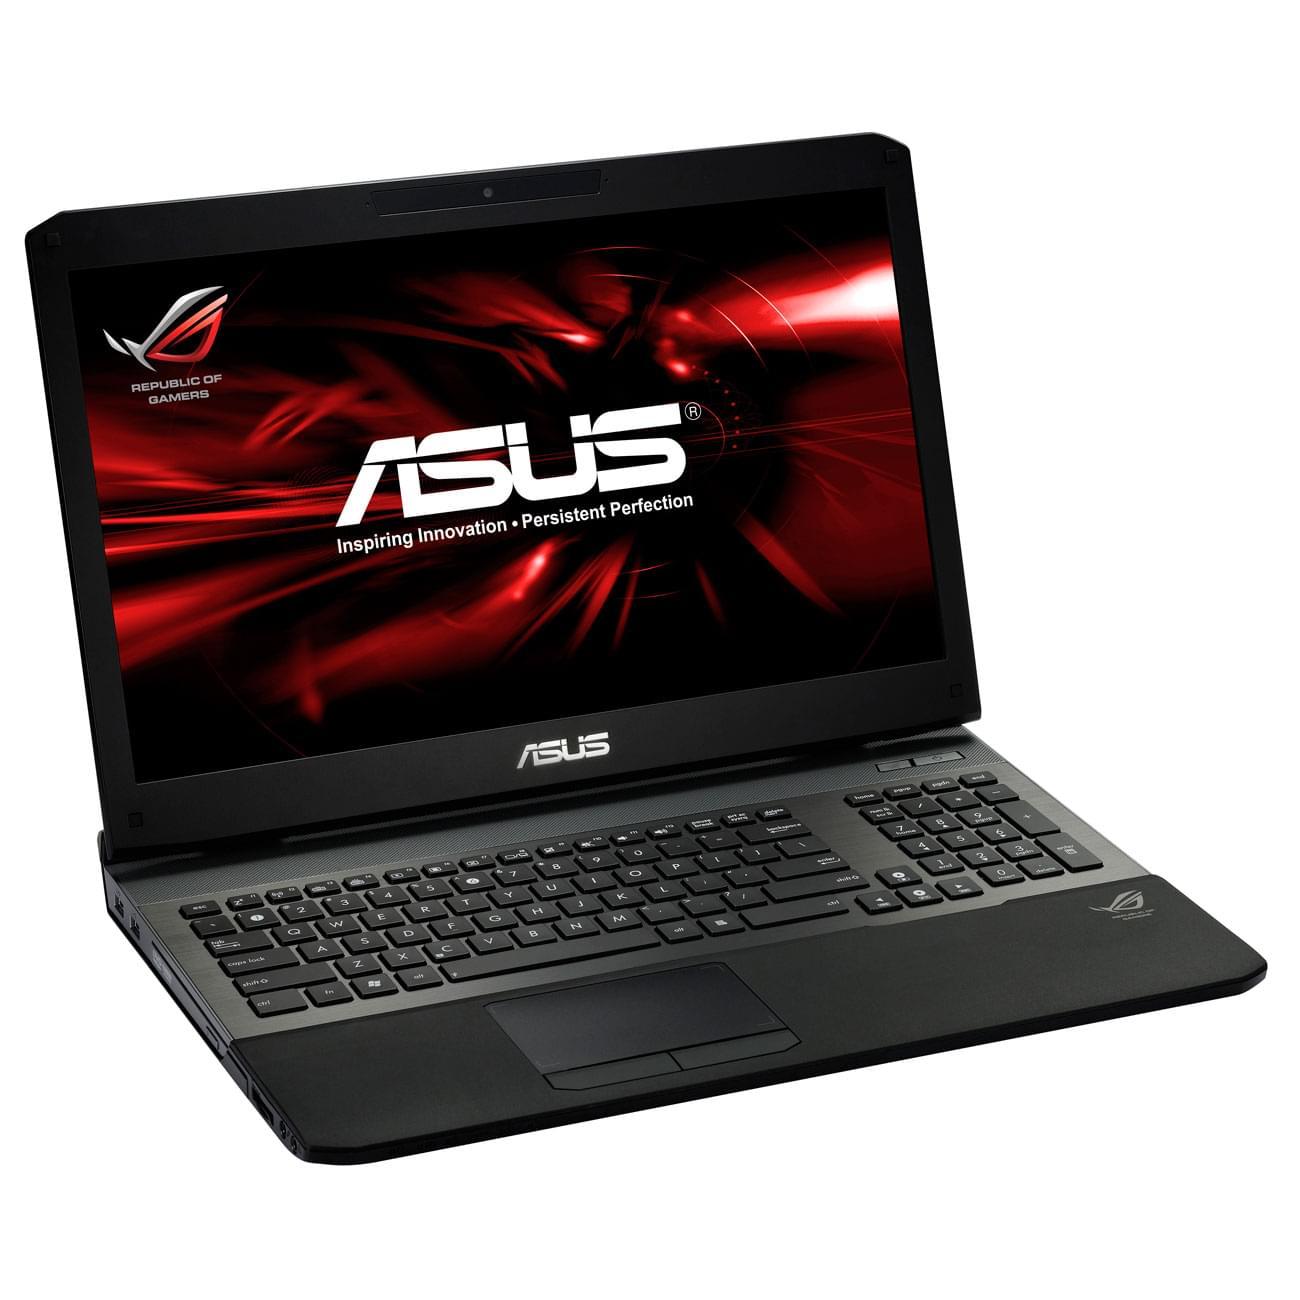 Asus G75VW-9Z381H (G75VW-9Z381H) - Achat / Vente PC Portable sur Cybertek.fr - 0